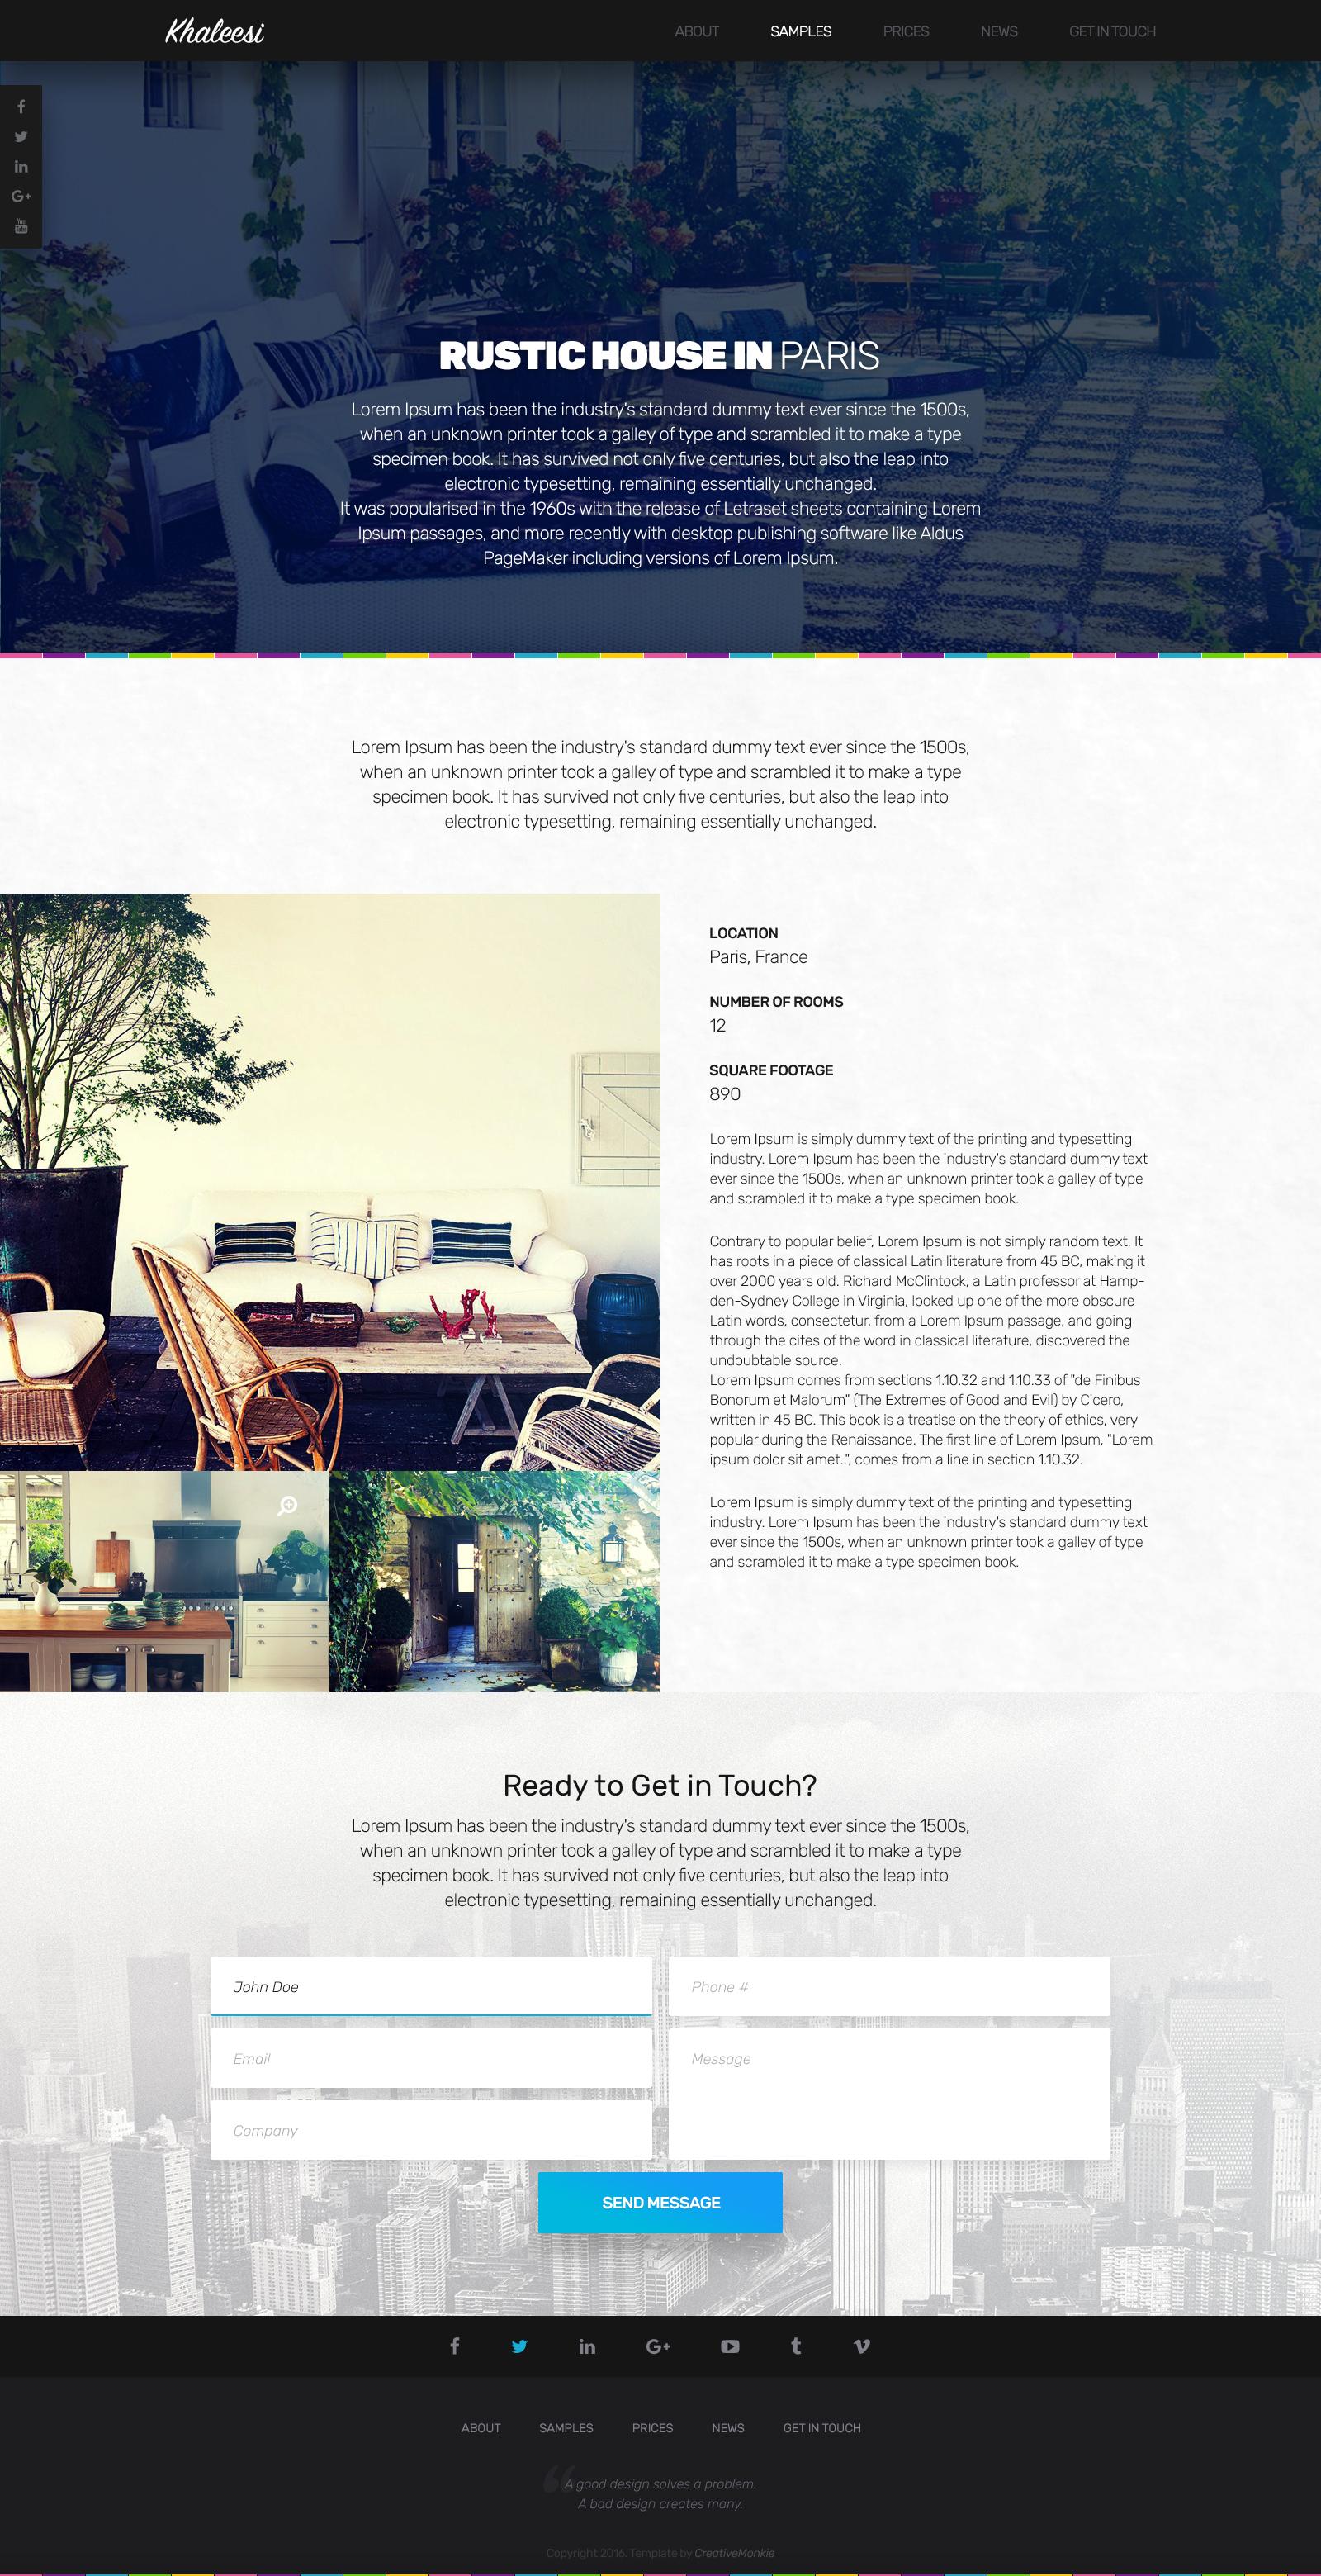 Khaleesi - Interior Design Agency - PSD template